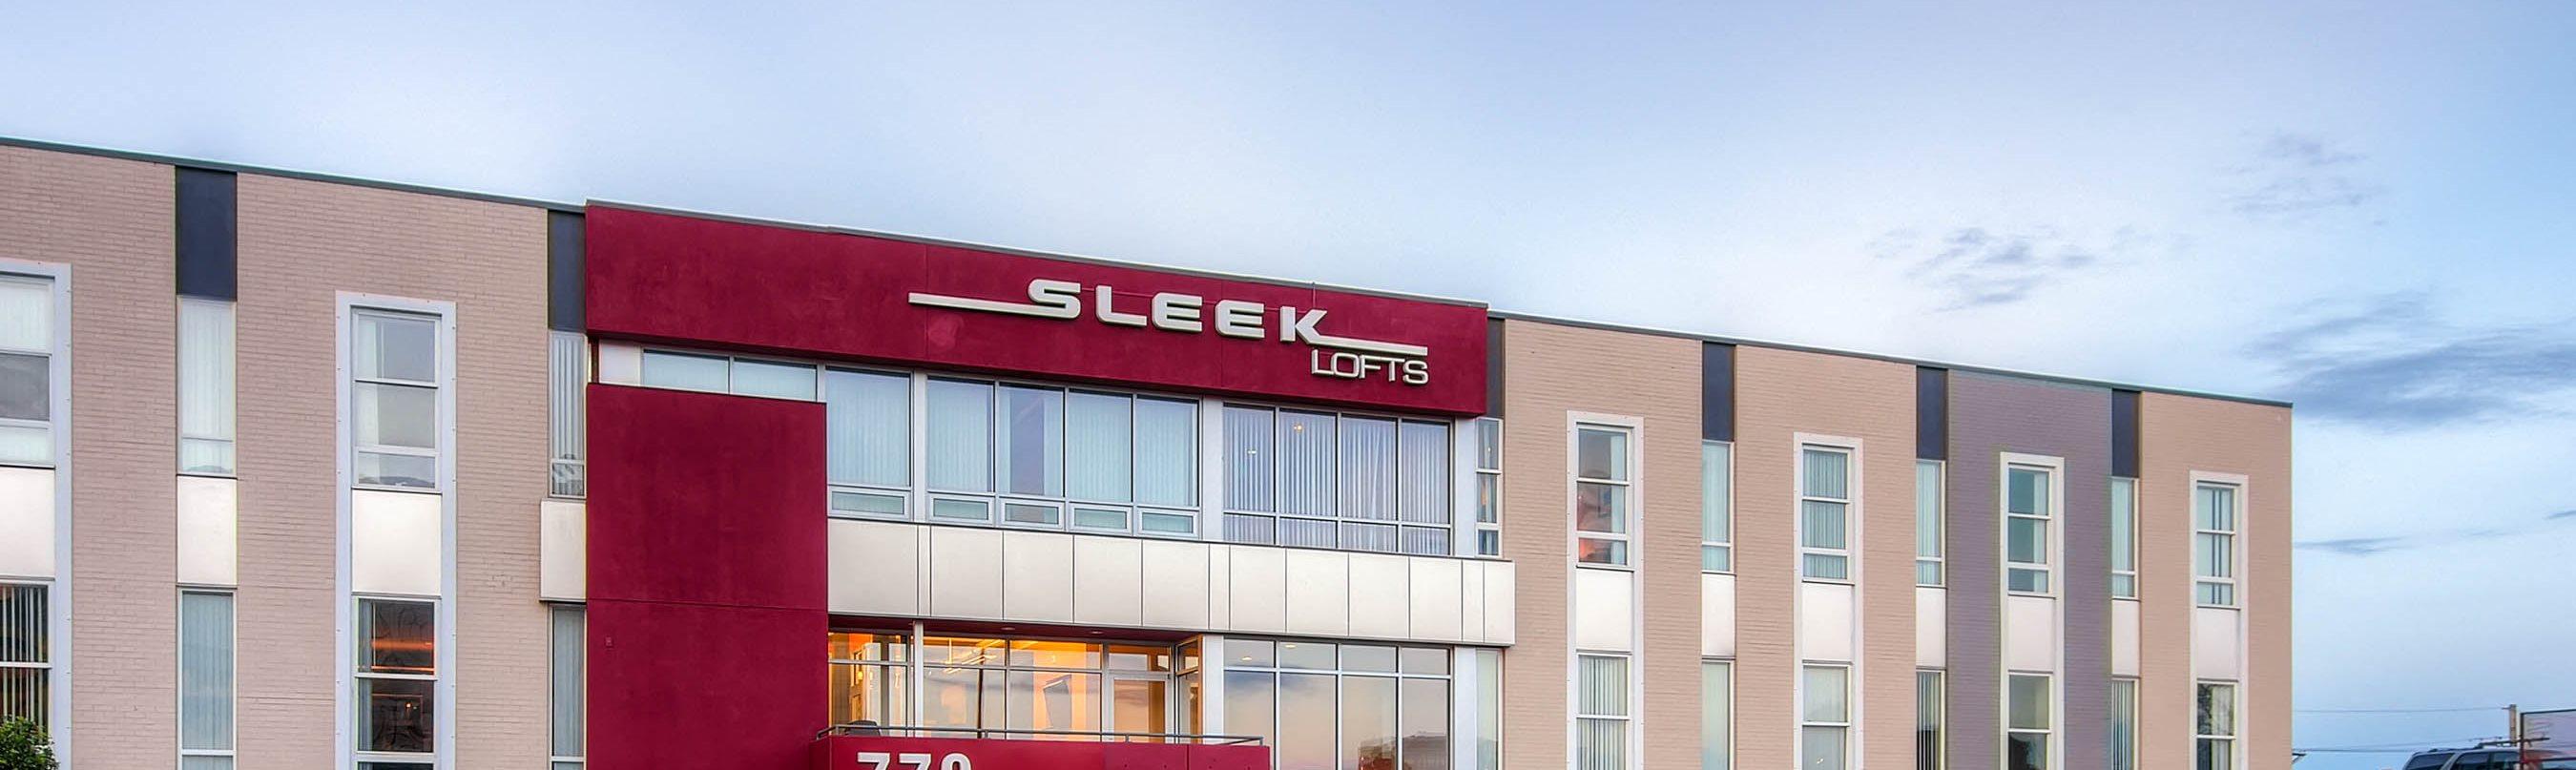 Sleek Lofts Building Exterior